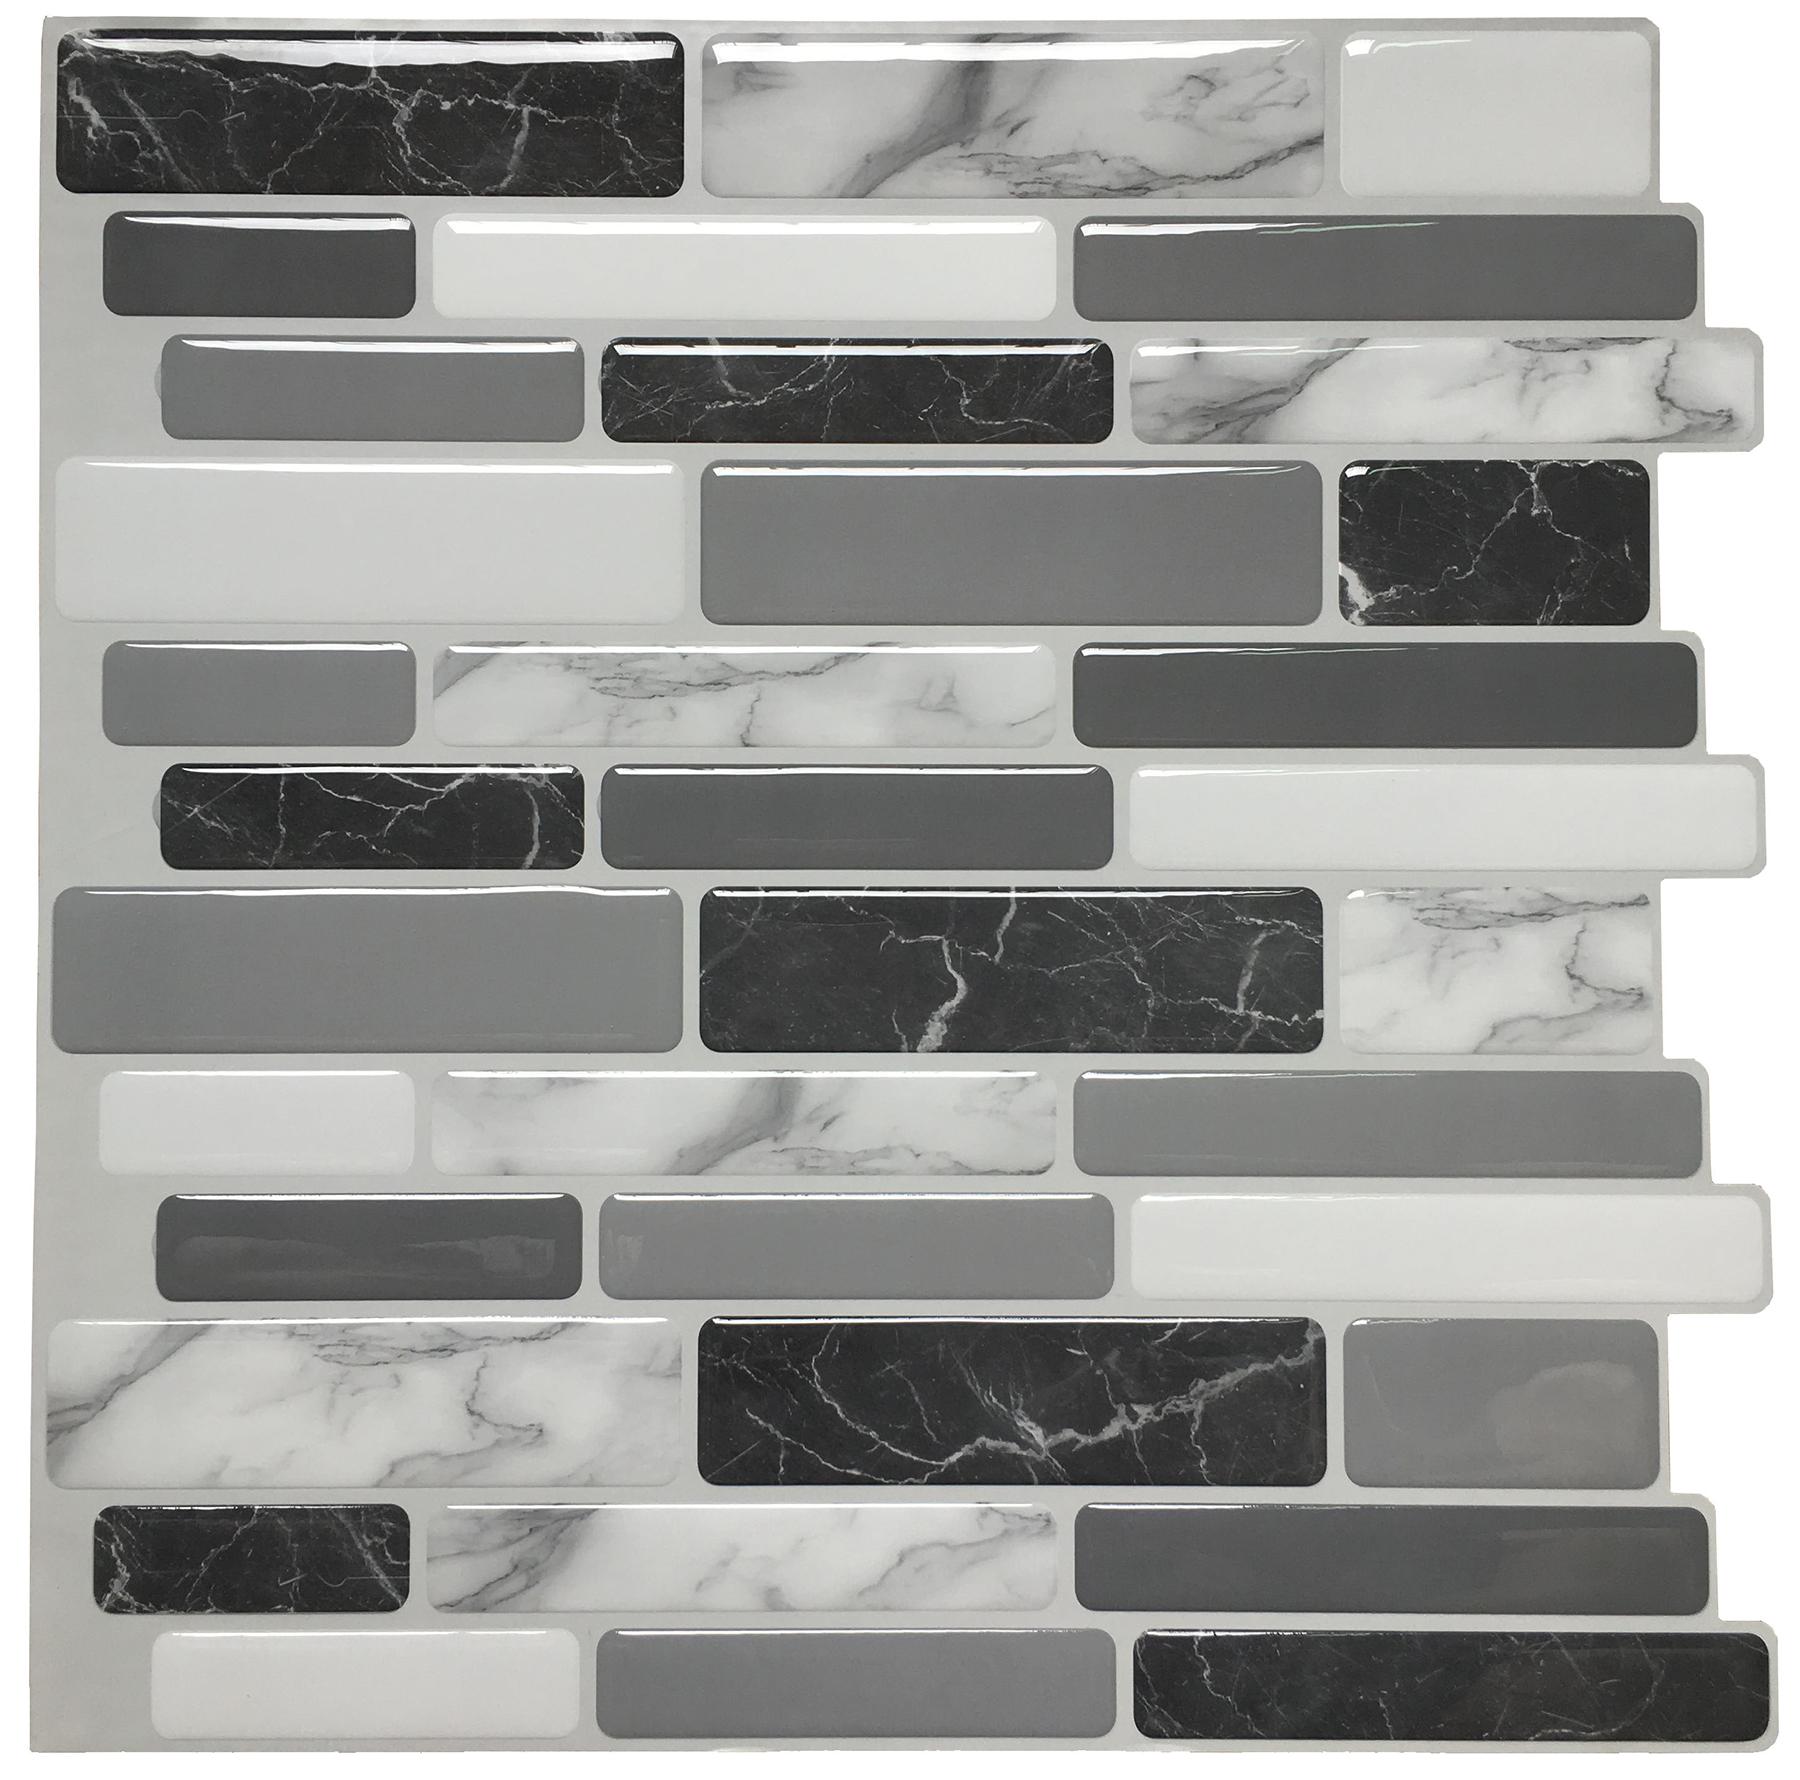 "10-Tiles Self Adhesive Wall Tile Peel and Stick Backsplash Tile for Kitchen, Marble Design 12""x12"""